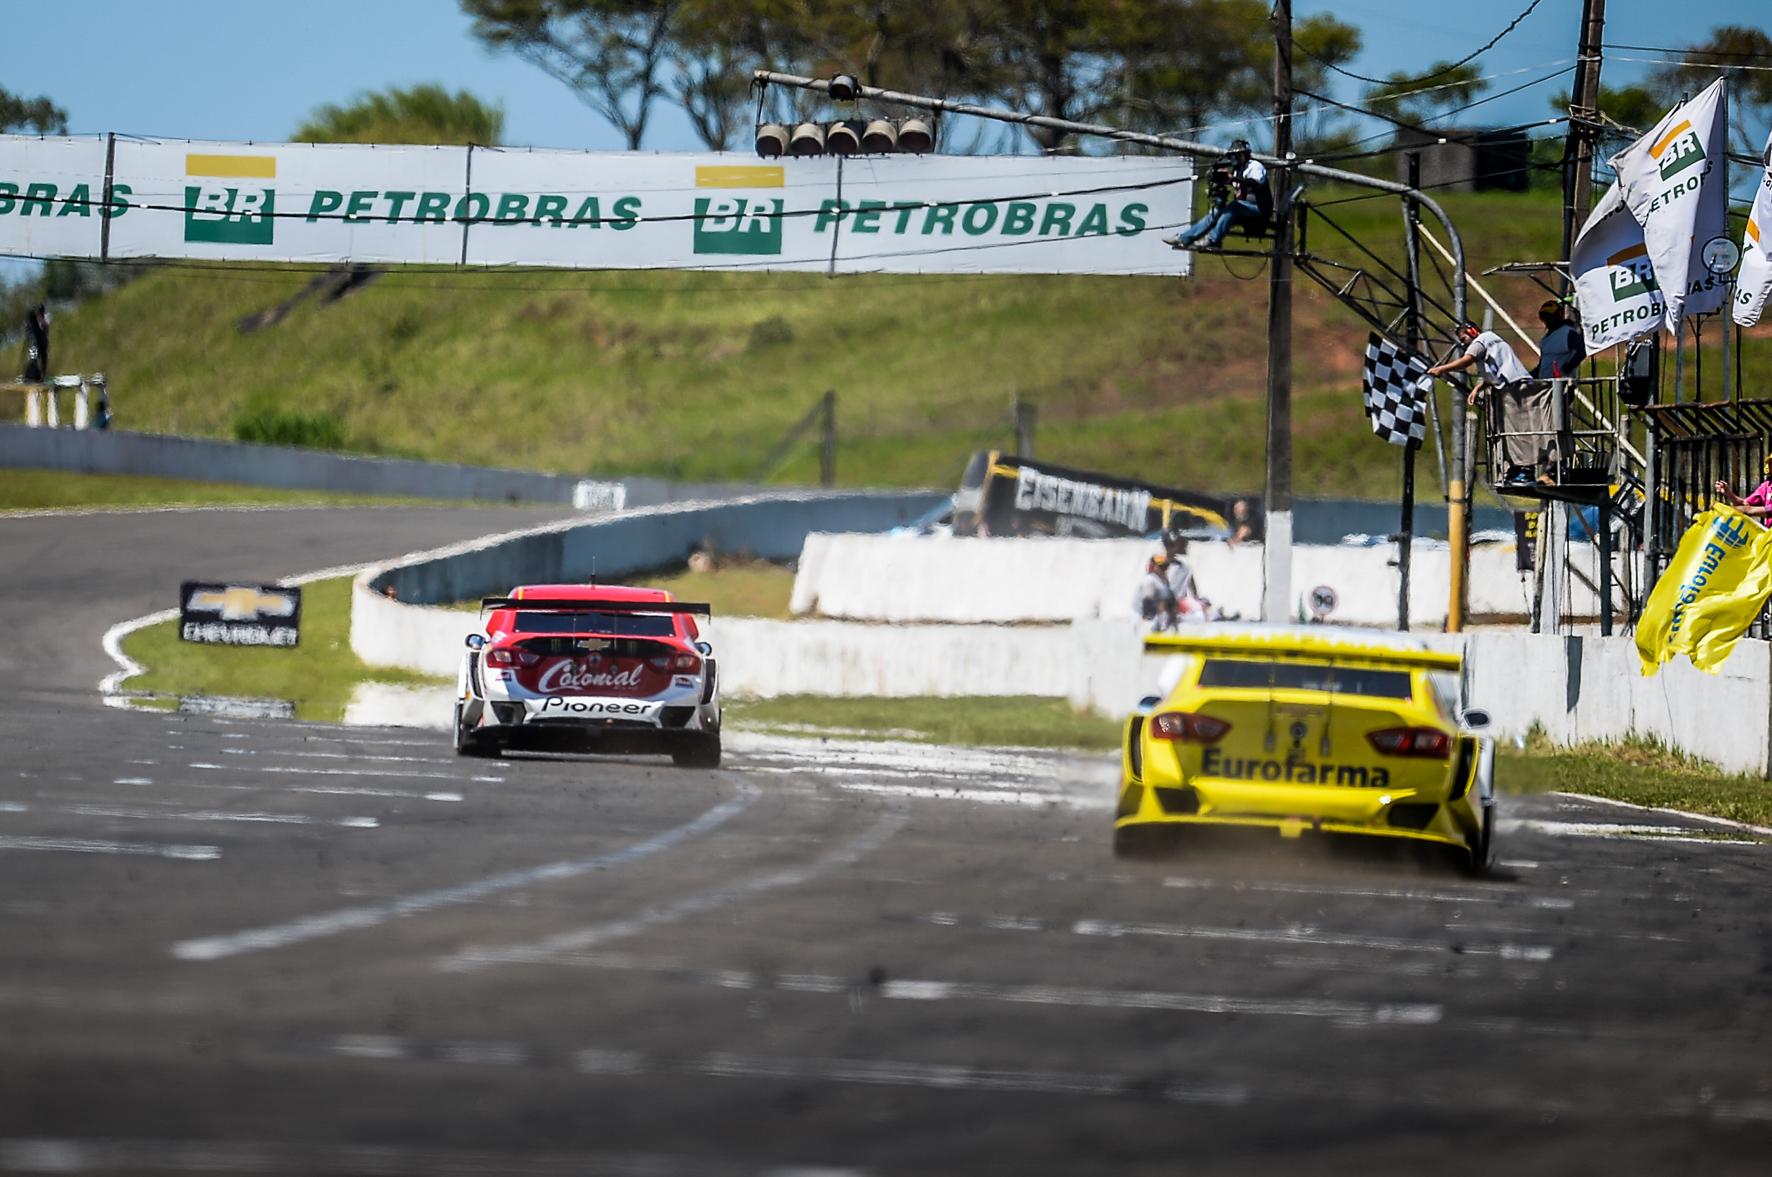 StockCar2018_dudabairros_Londrina-47872.